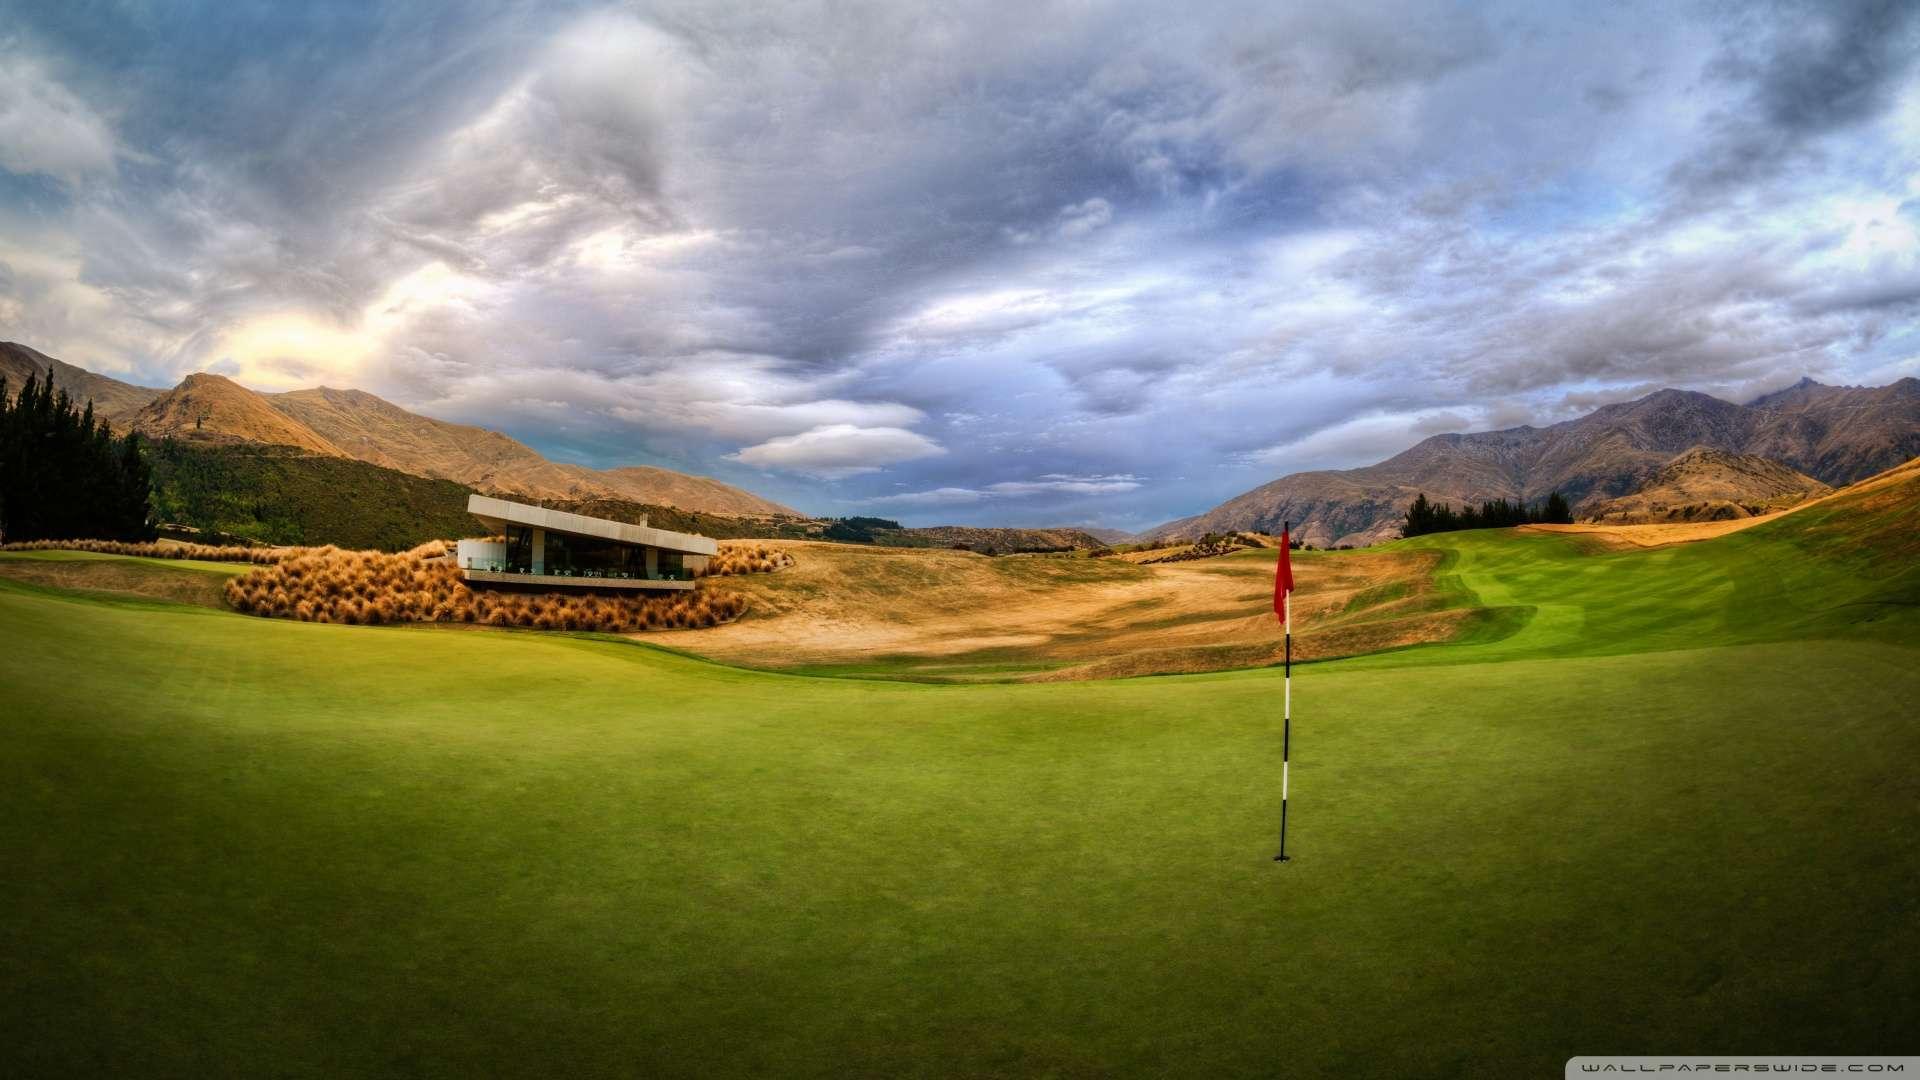 Wallpaper Beautiful Golf Course 2 Wallpaper 1080p HD Upload at 1920x1080